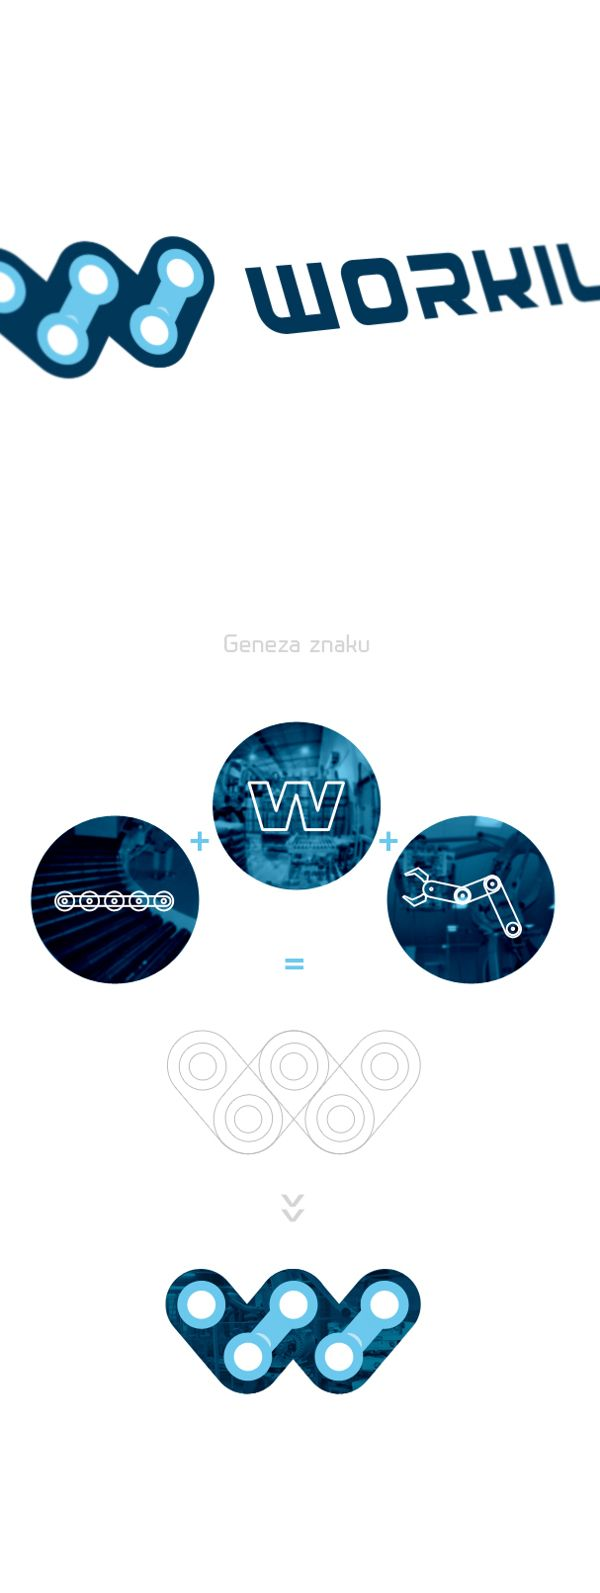 Workil Robotics - logo for SALE by Karol Sidorowski, via Behance